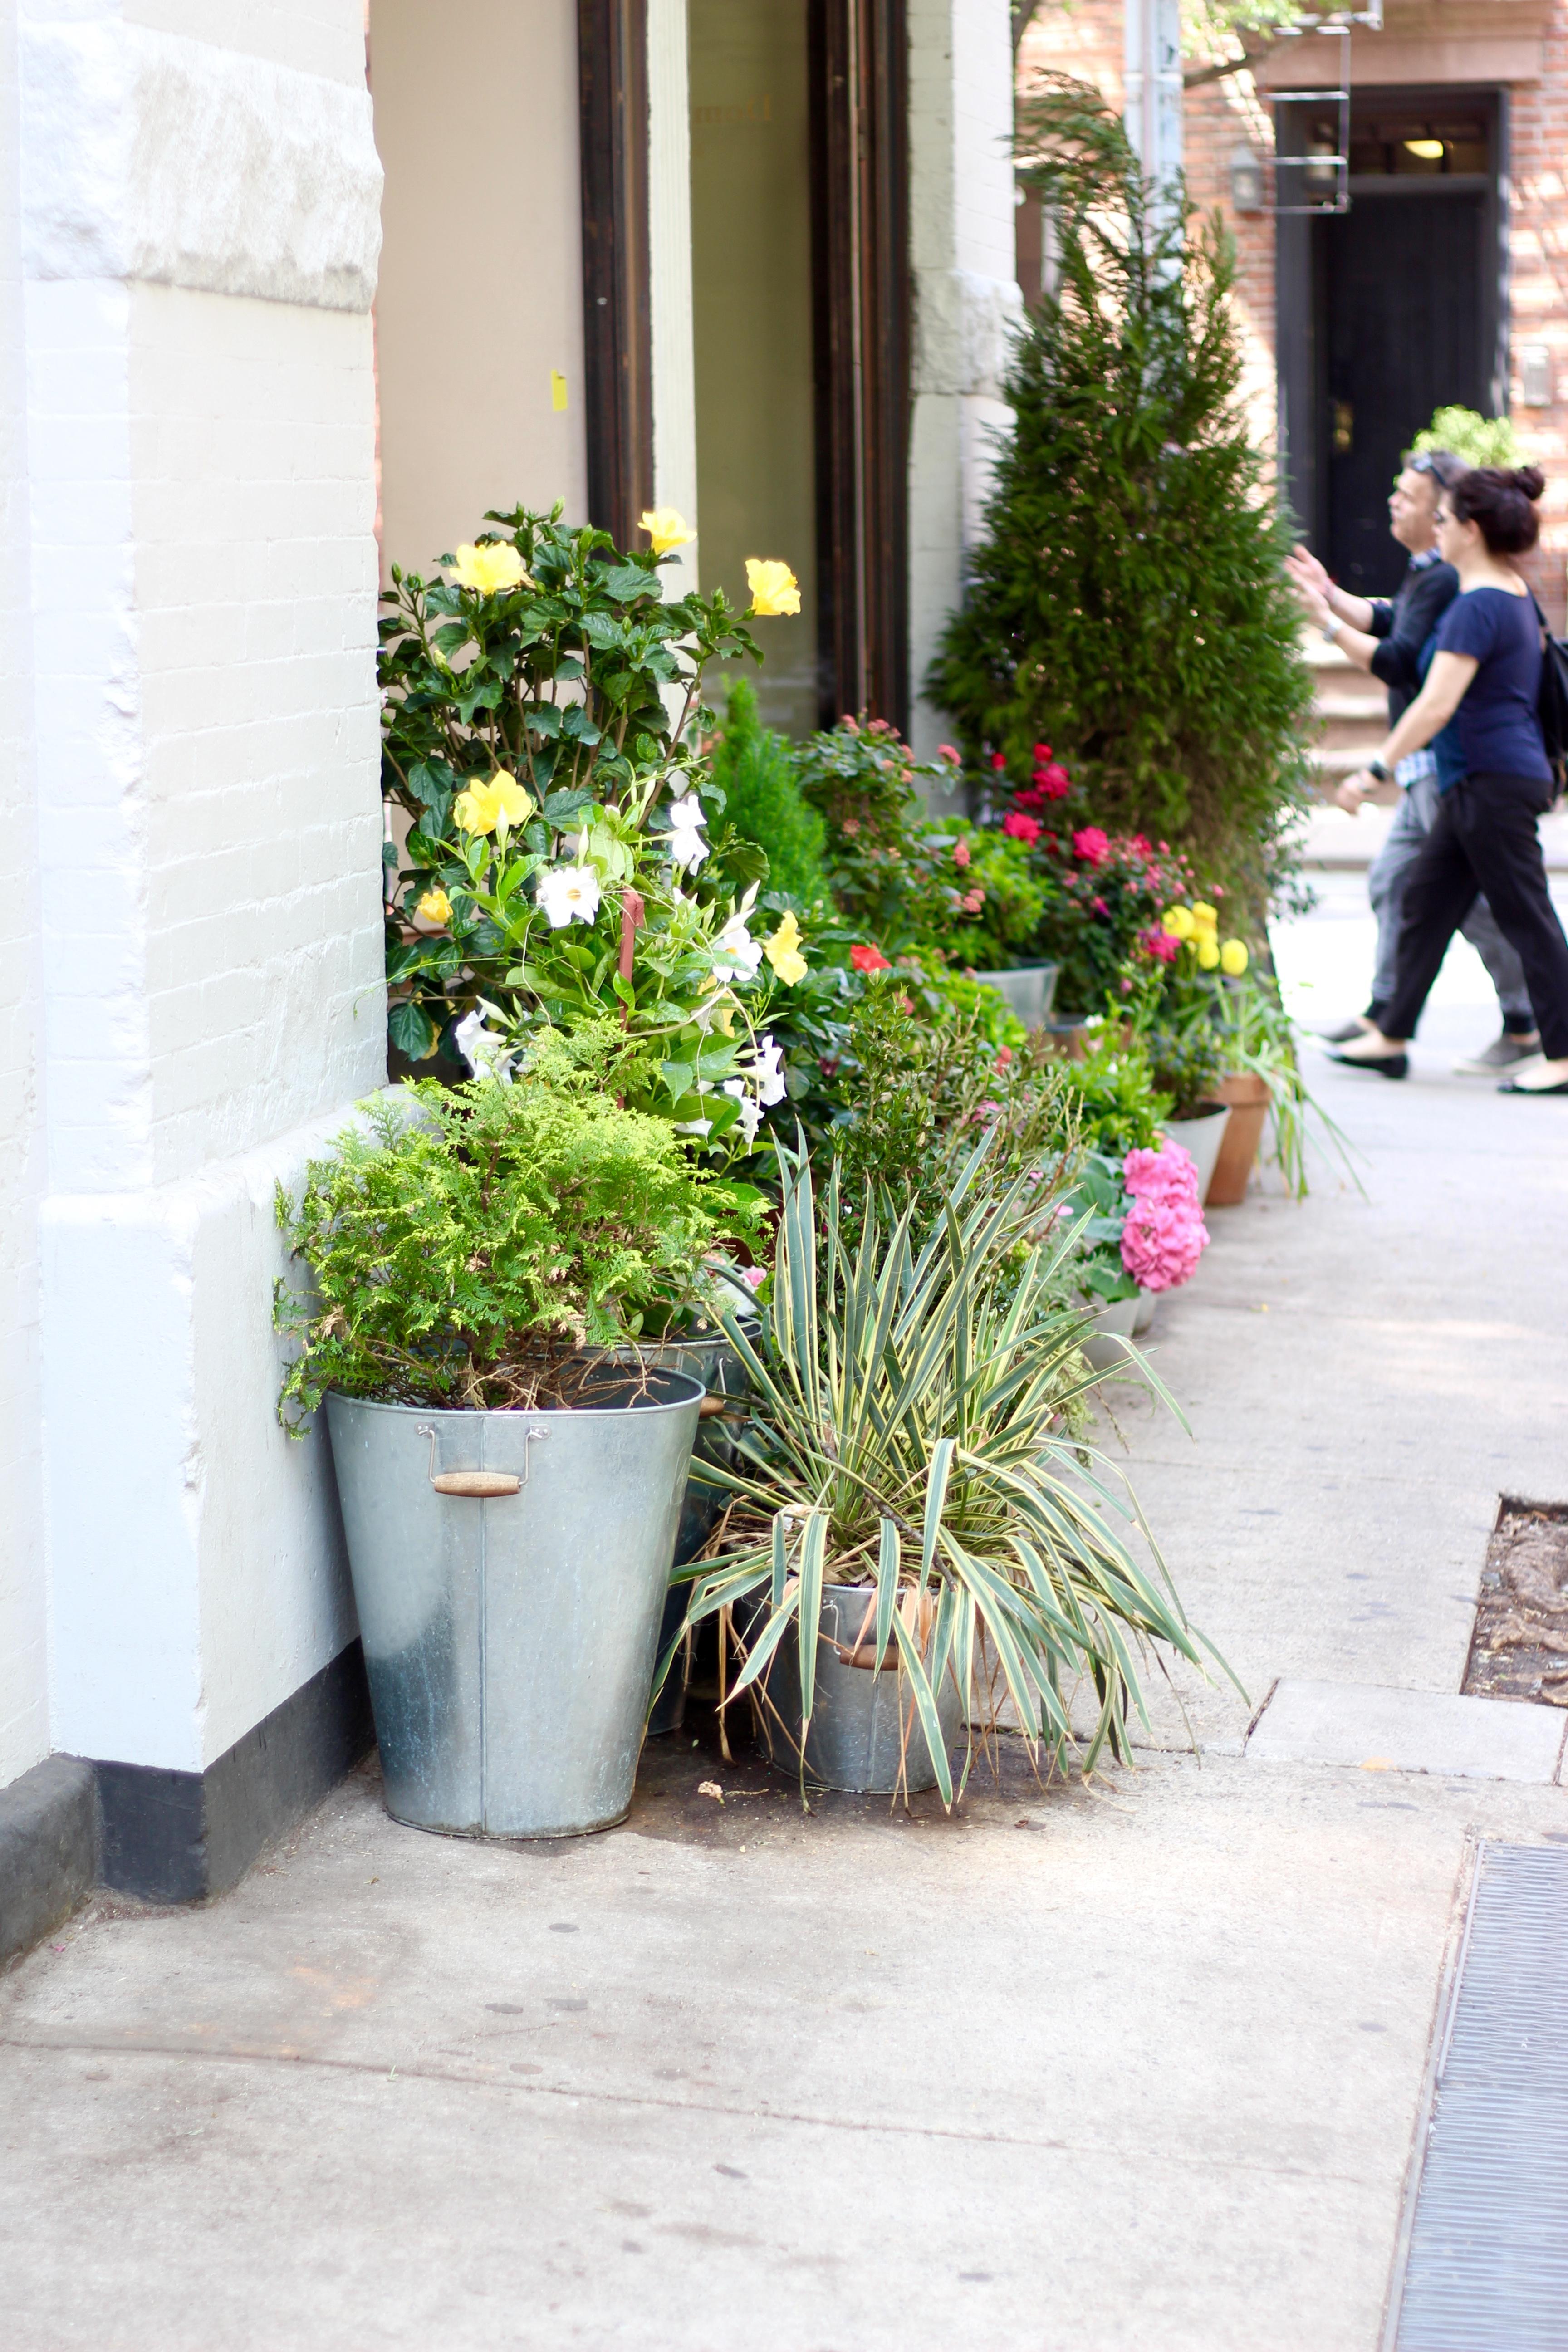 new york city flowers in soho | Audrey Madison Stowe Blog